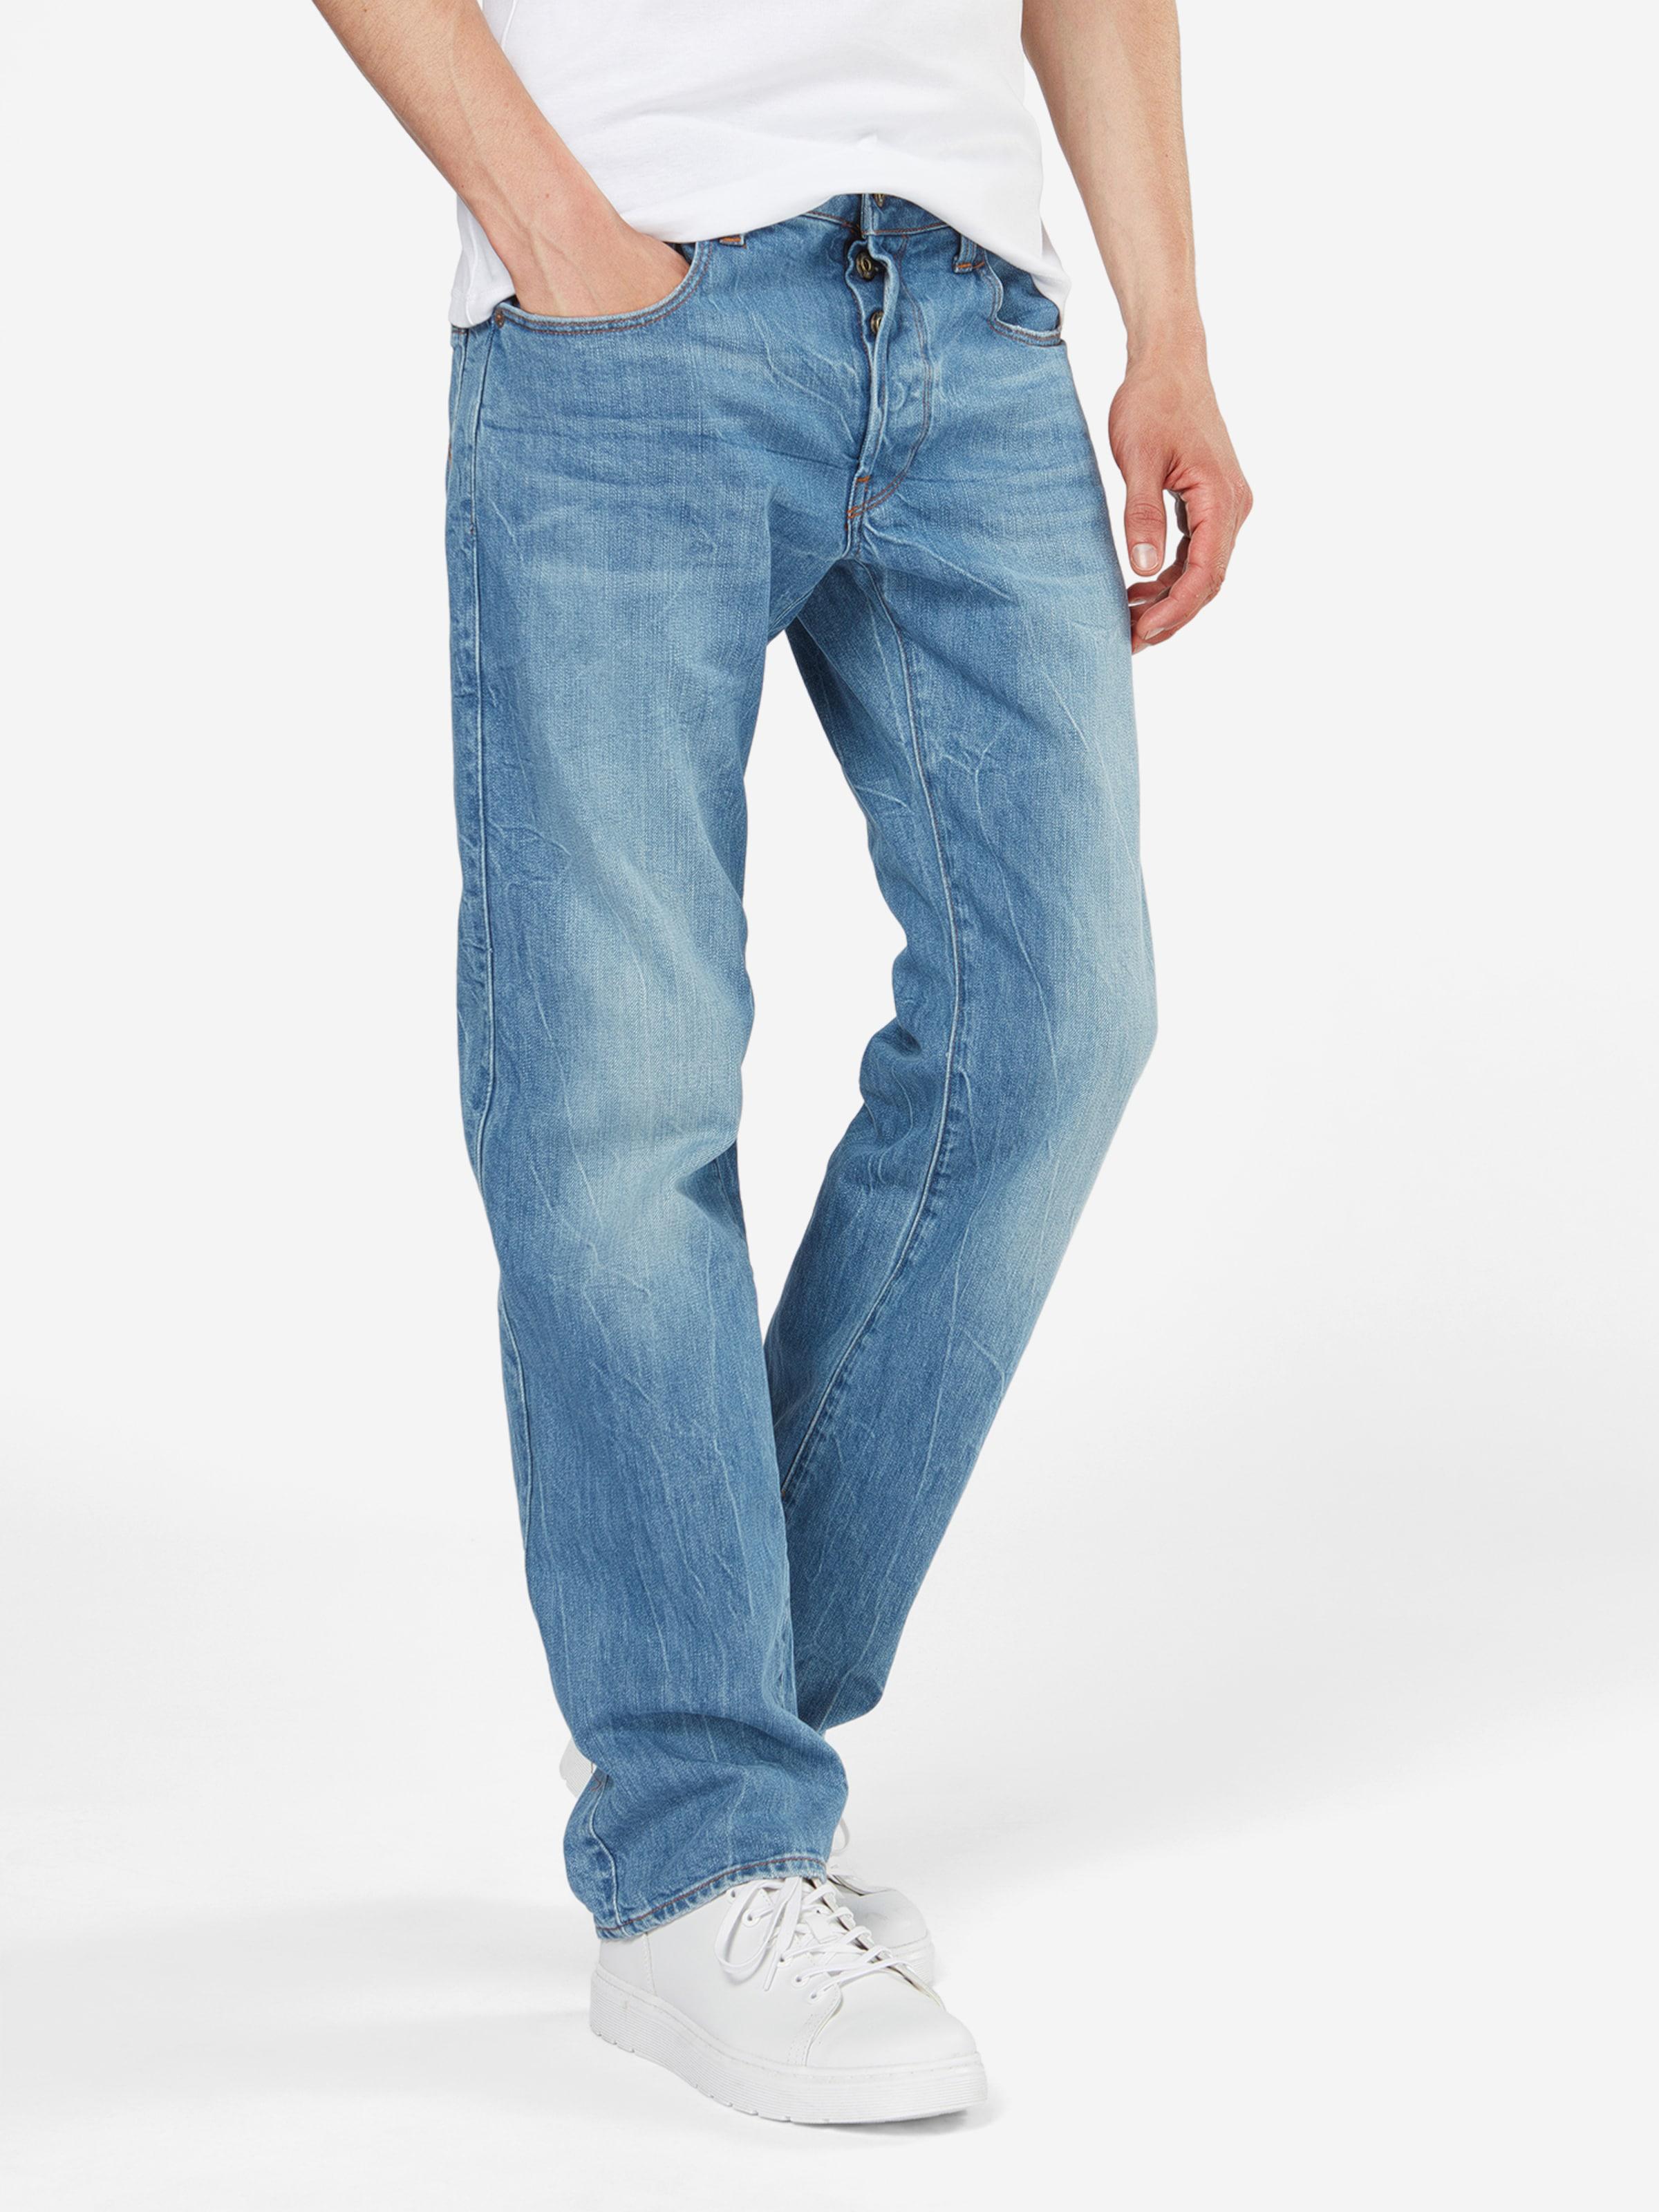 Jeans G Straight' STAR STAR G RAW '3301 I0xRwpqR